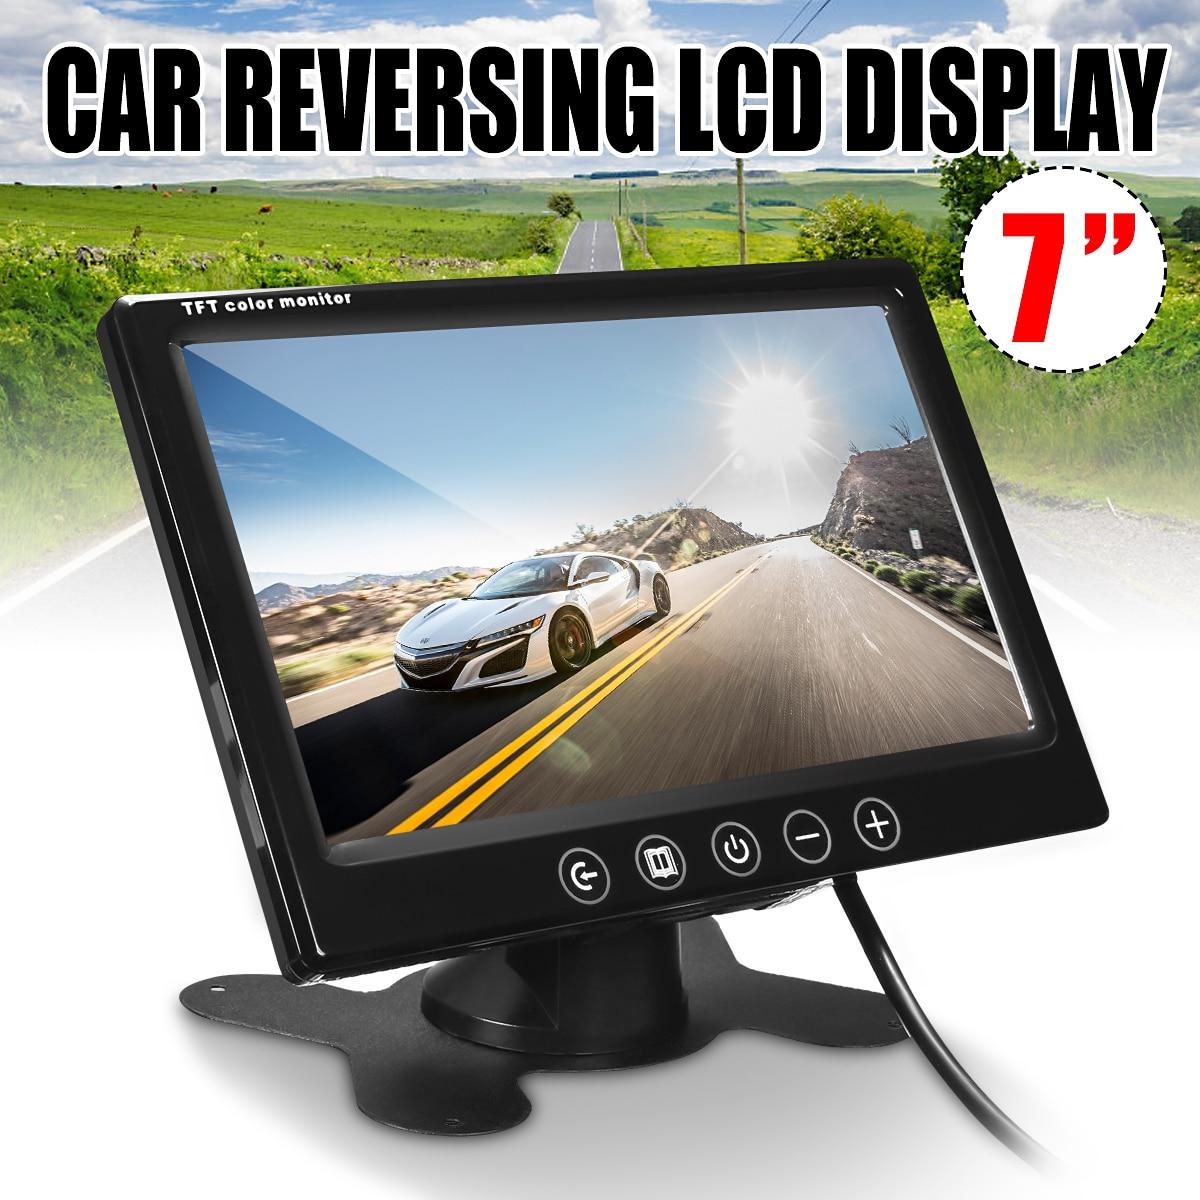 7 zoll TFT LCD Auto-Monitor Rearview Screen HDMI VGA DVD Digital Display HD Auflösung Parkplatz Backup-Kamera + Fernbedienung control